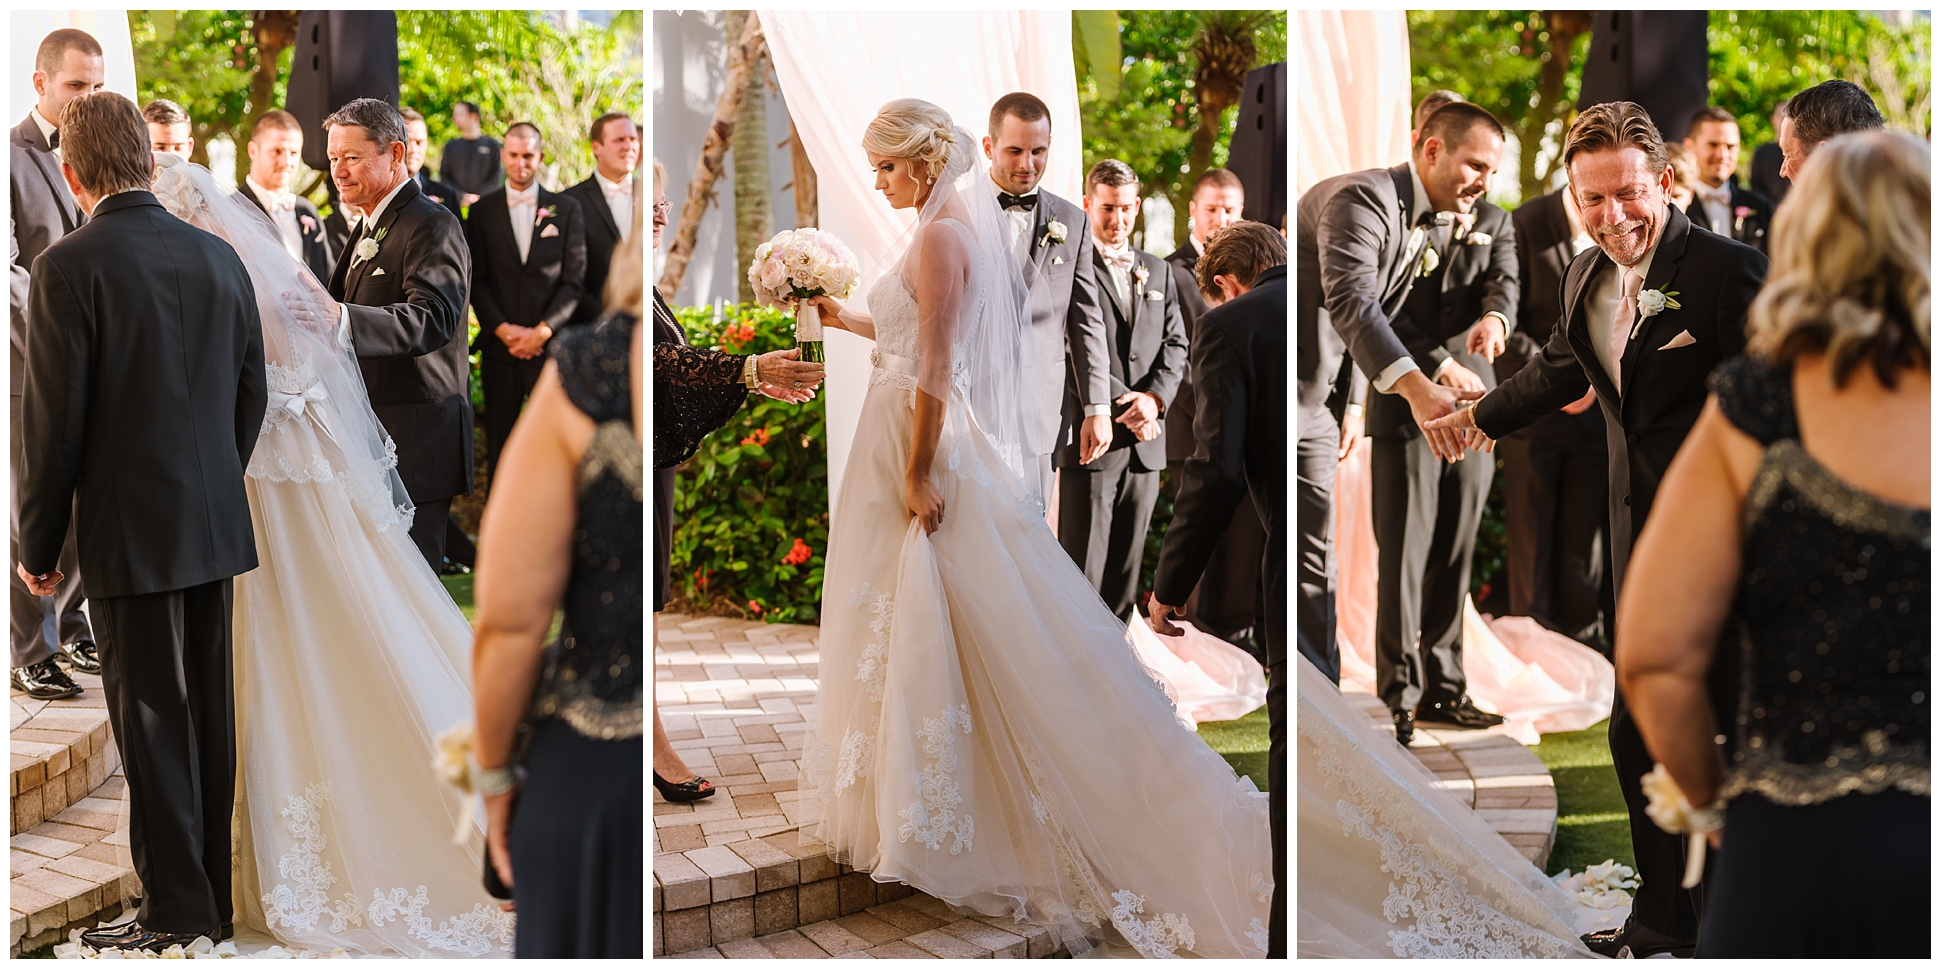 Sarasota-wedding-photographer-hyatt-regency-blush_0037.jpg